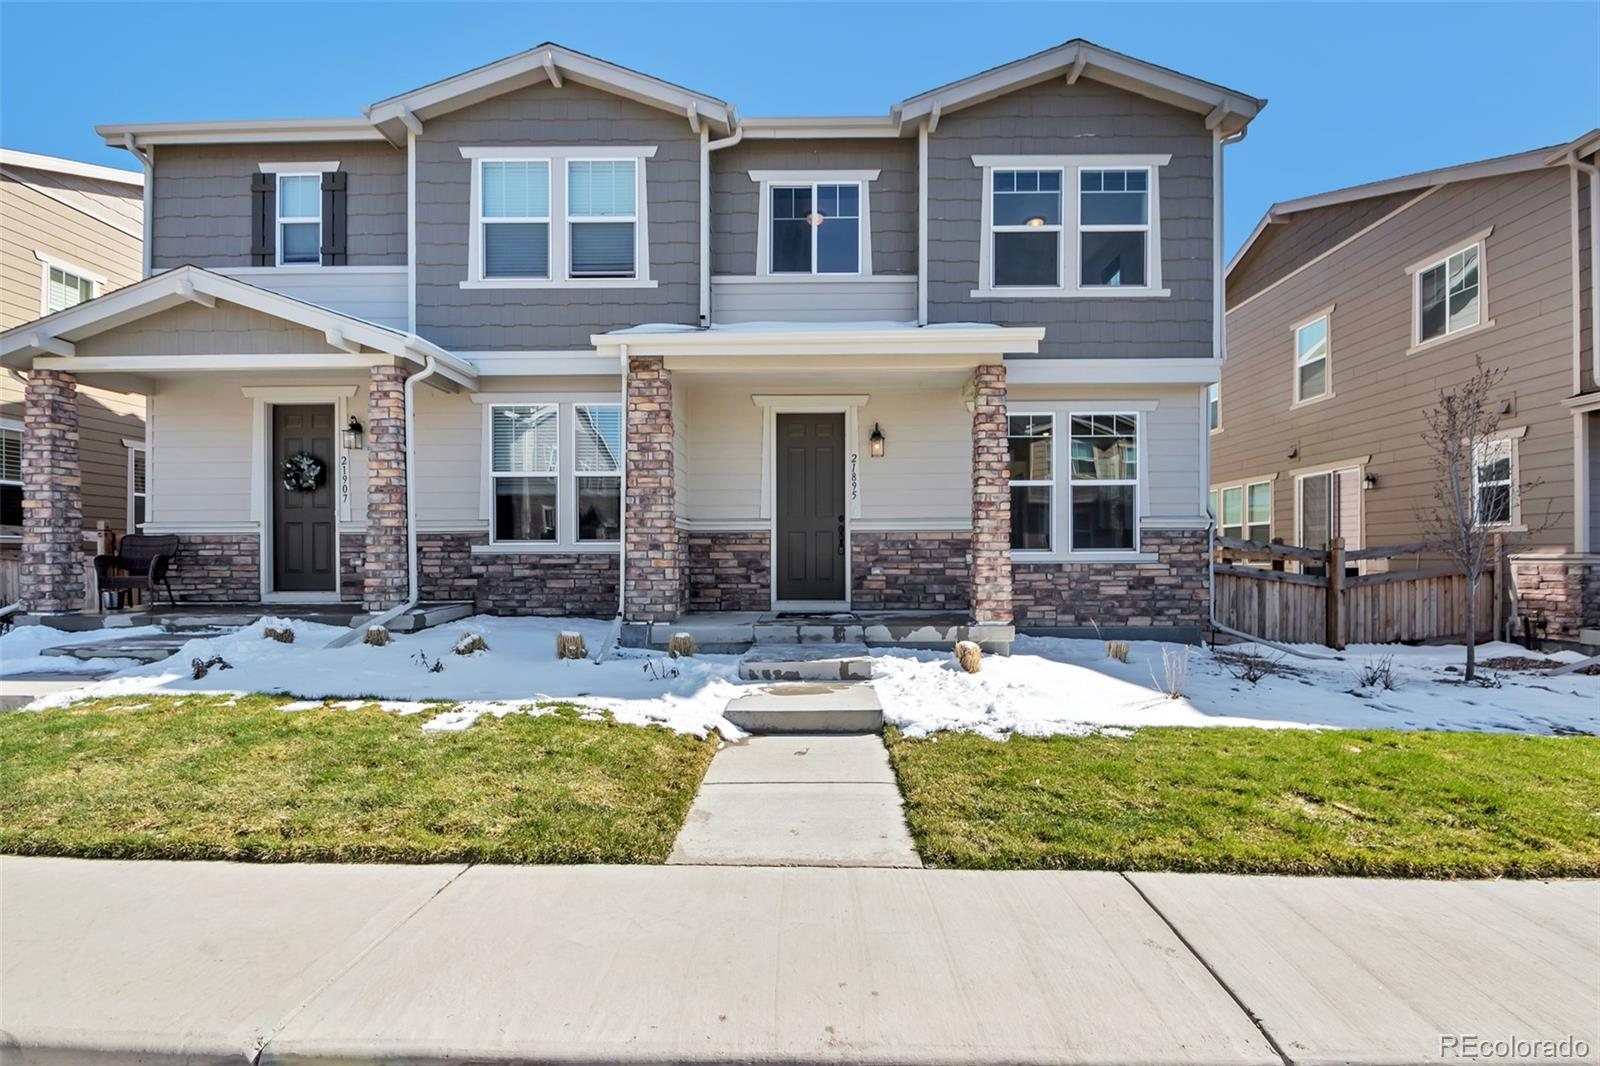 21895 E Radcliff Circle, Aurora, CO 80015 - Aurora, CO real estate listing